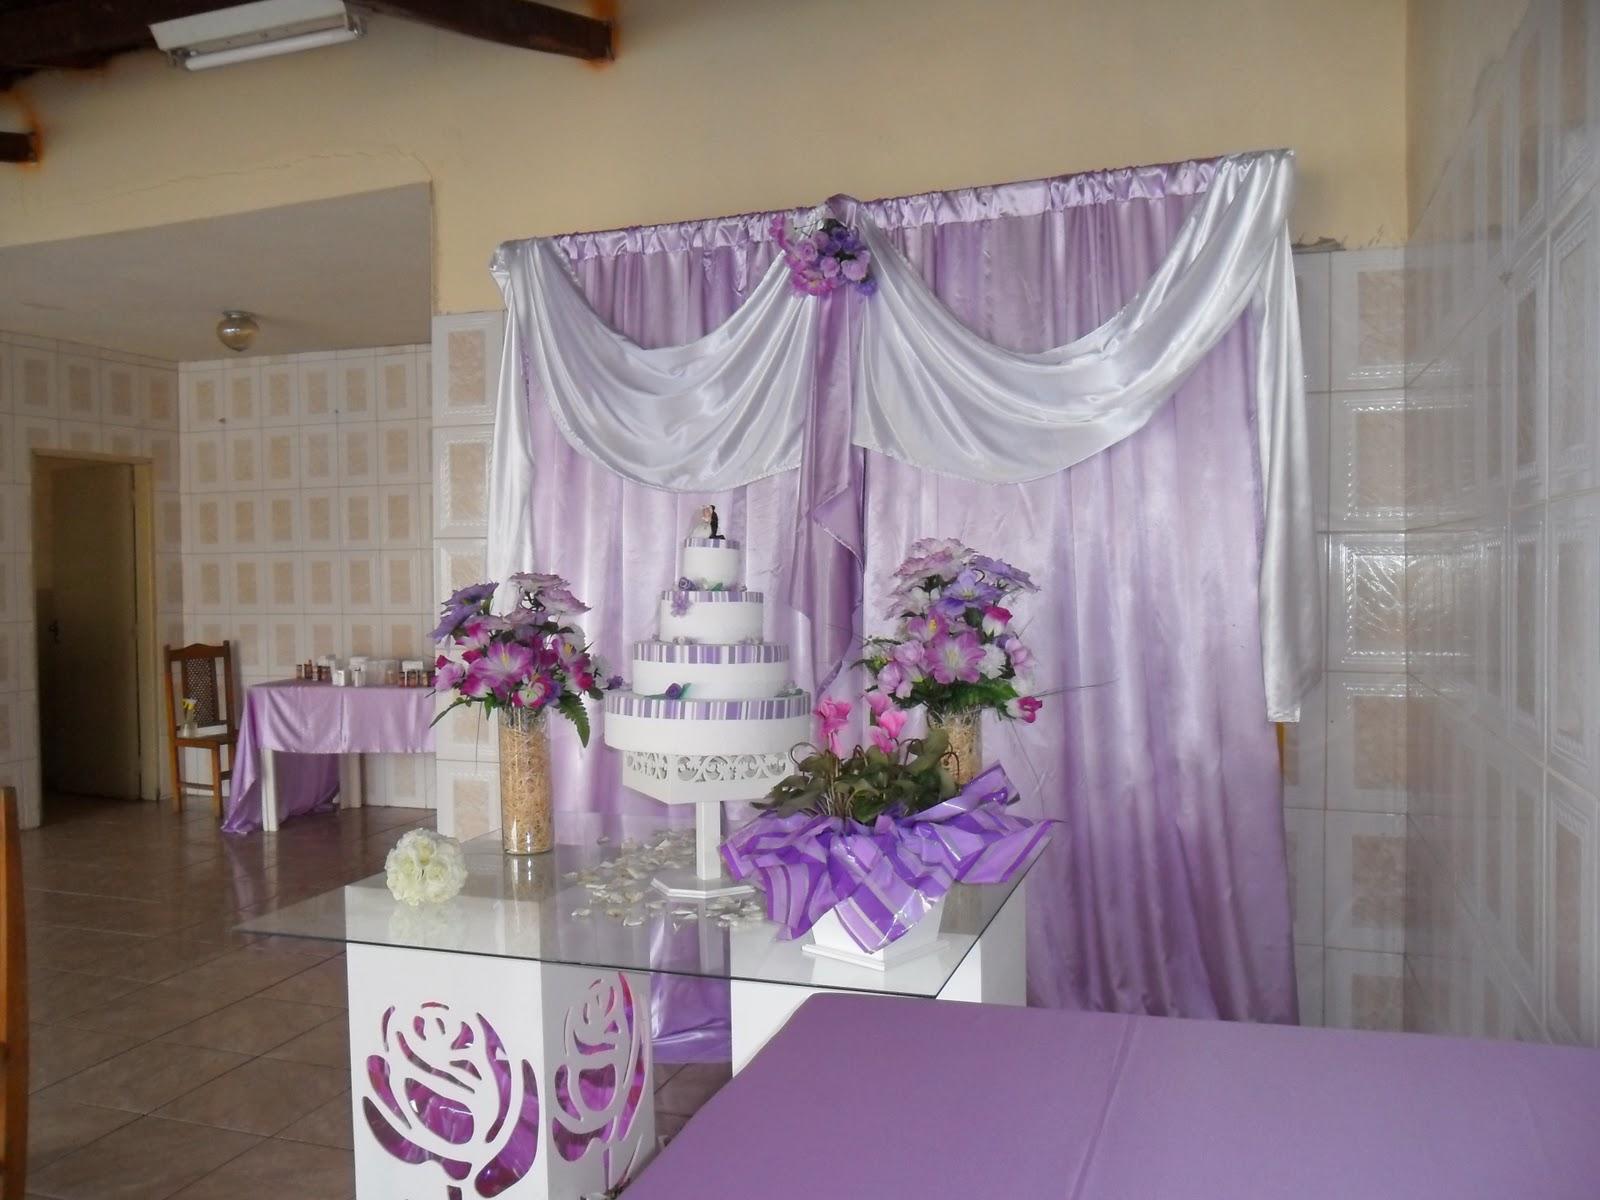 decoracao branco e lilas para casamento:TO BLESS DECORAÇÕES: LILAS E BRANCO CASAMENTO DA ESTHER E JEFERSON